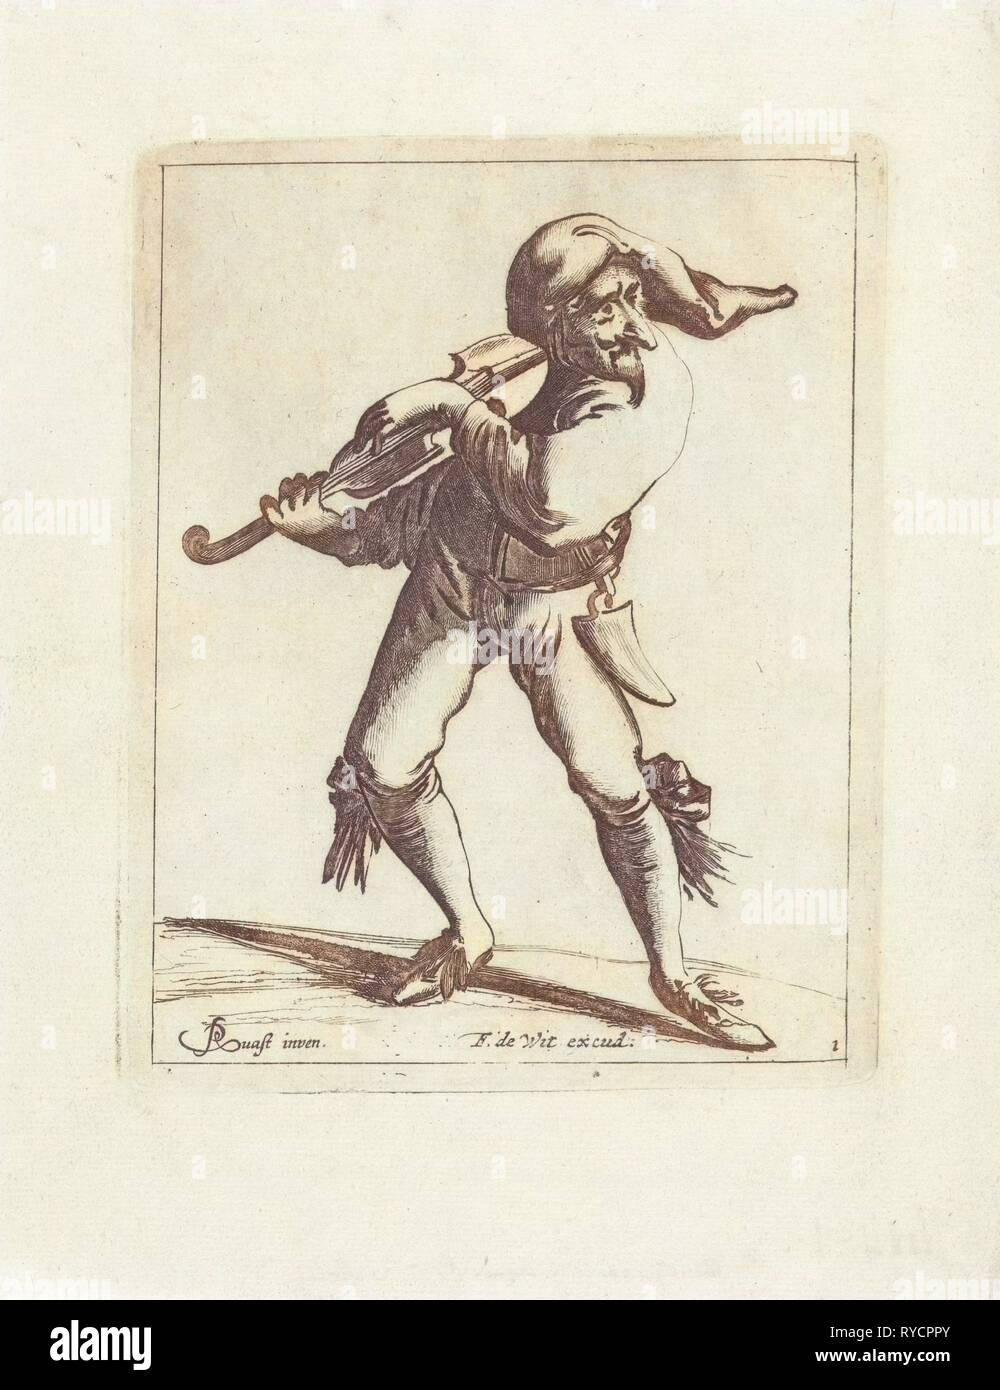 Jester with a violin, print maker: Pieter Jansz. Quast, Frederik de Wit, 1639 - 1706 - Stock Image